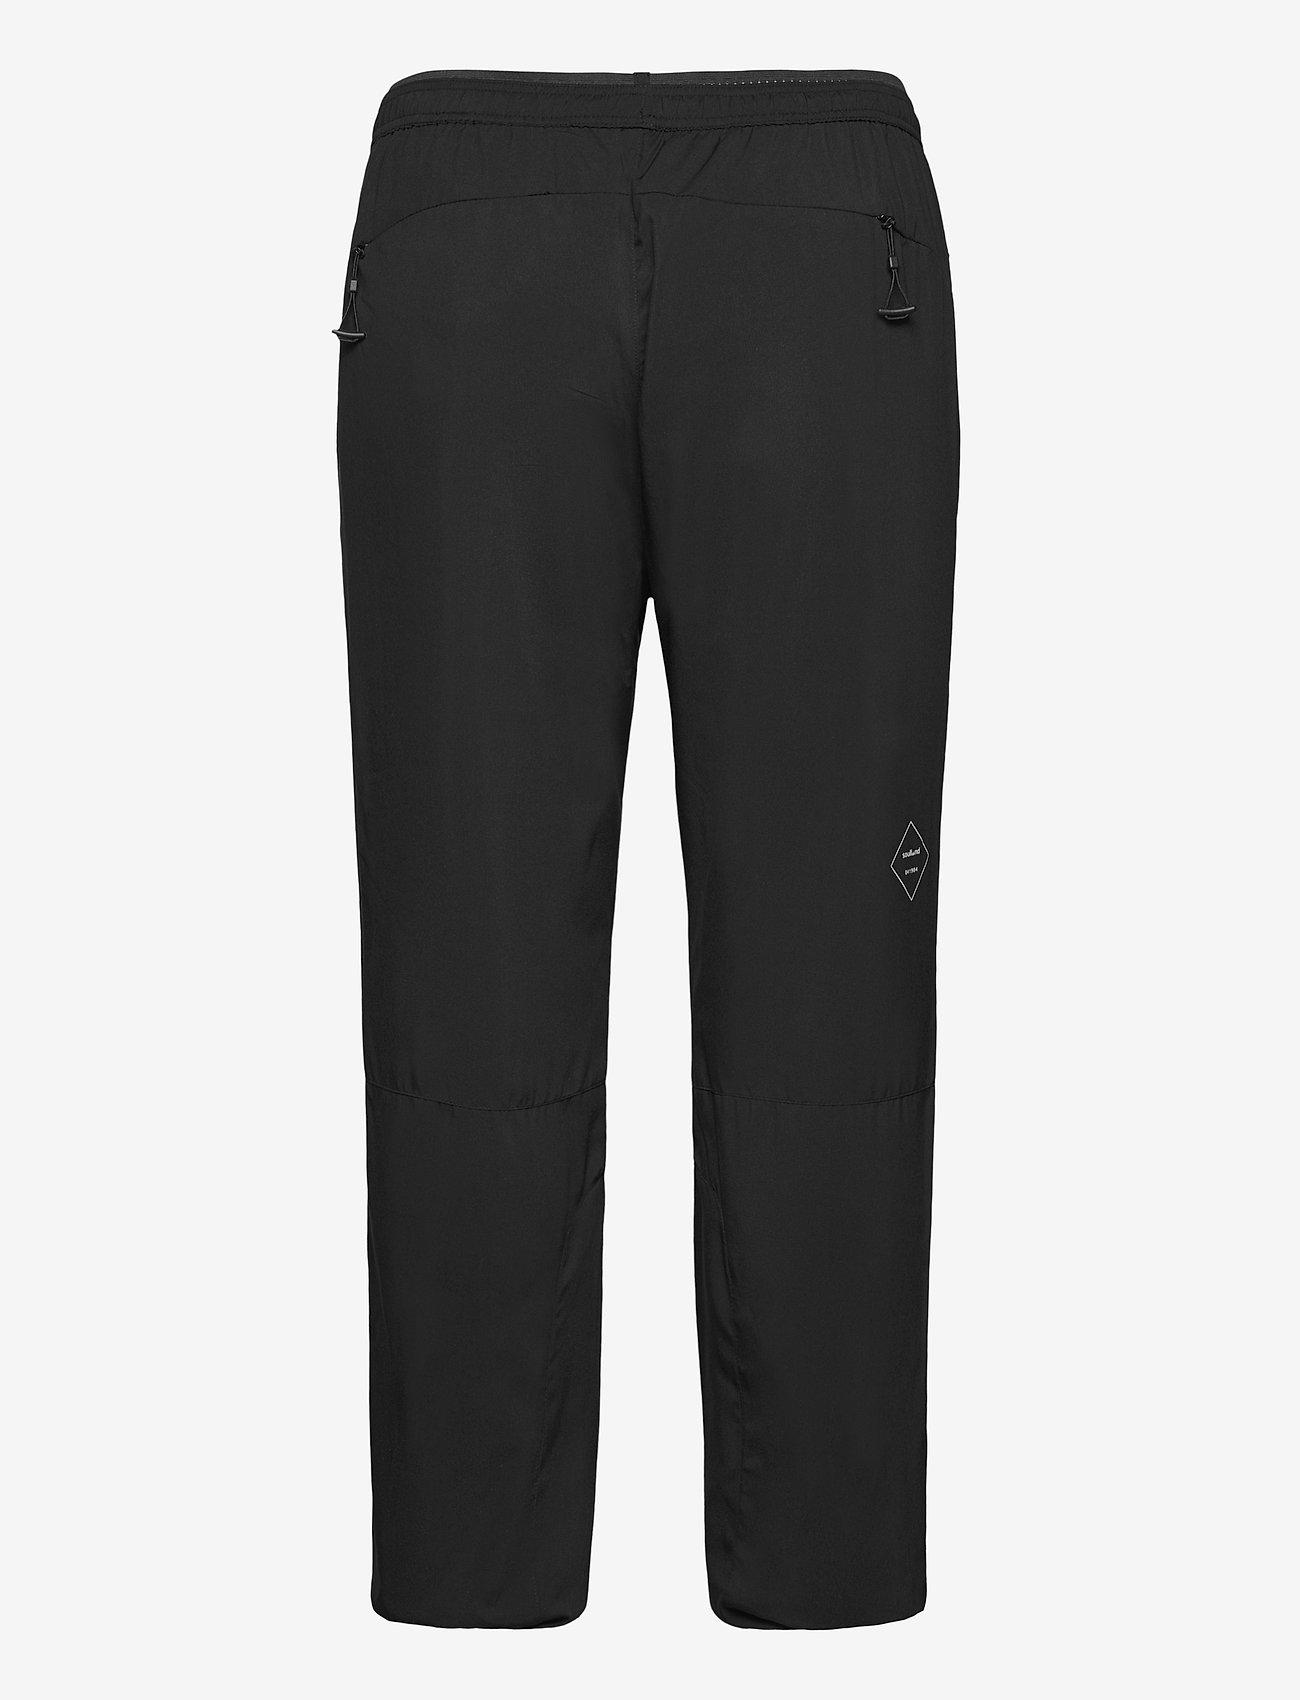 Soulland - Frey pants - spodnie na co dzień - black - 2